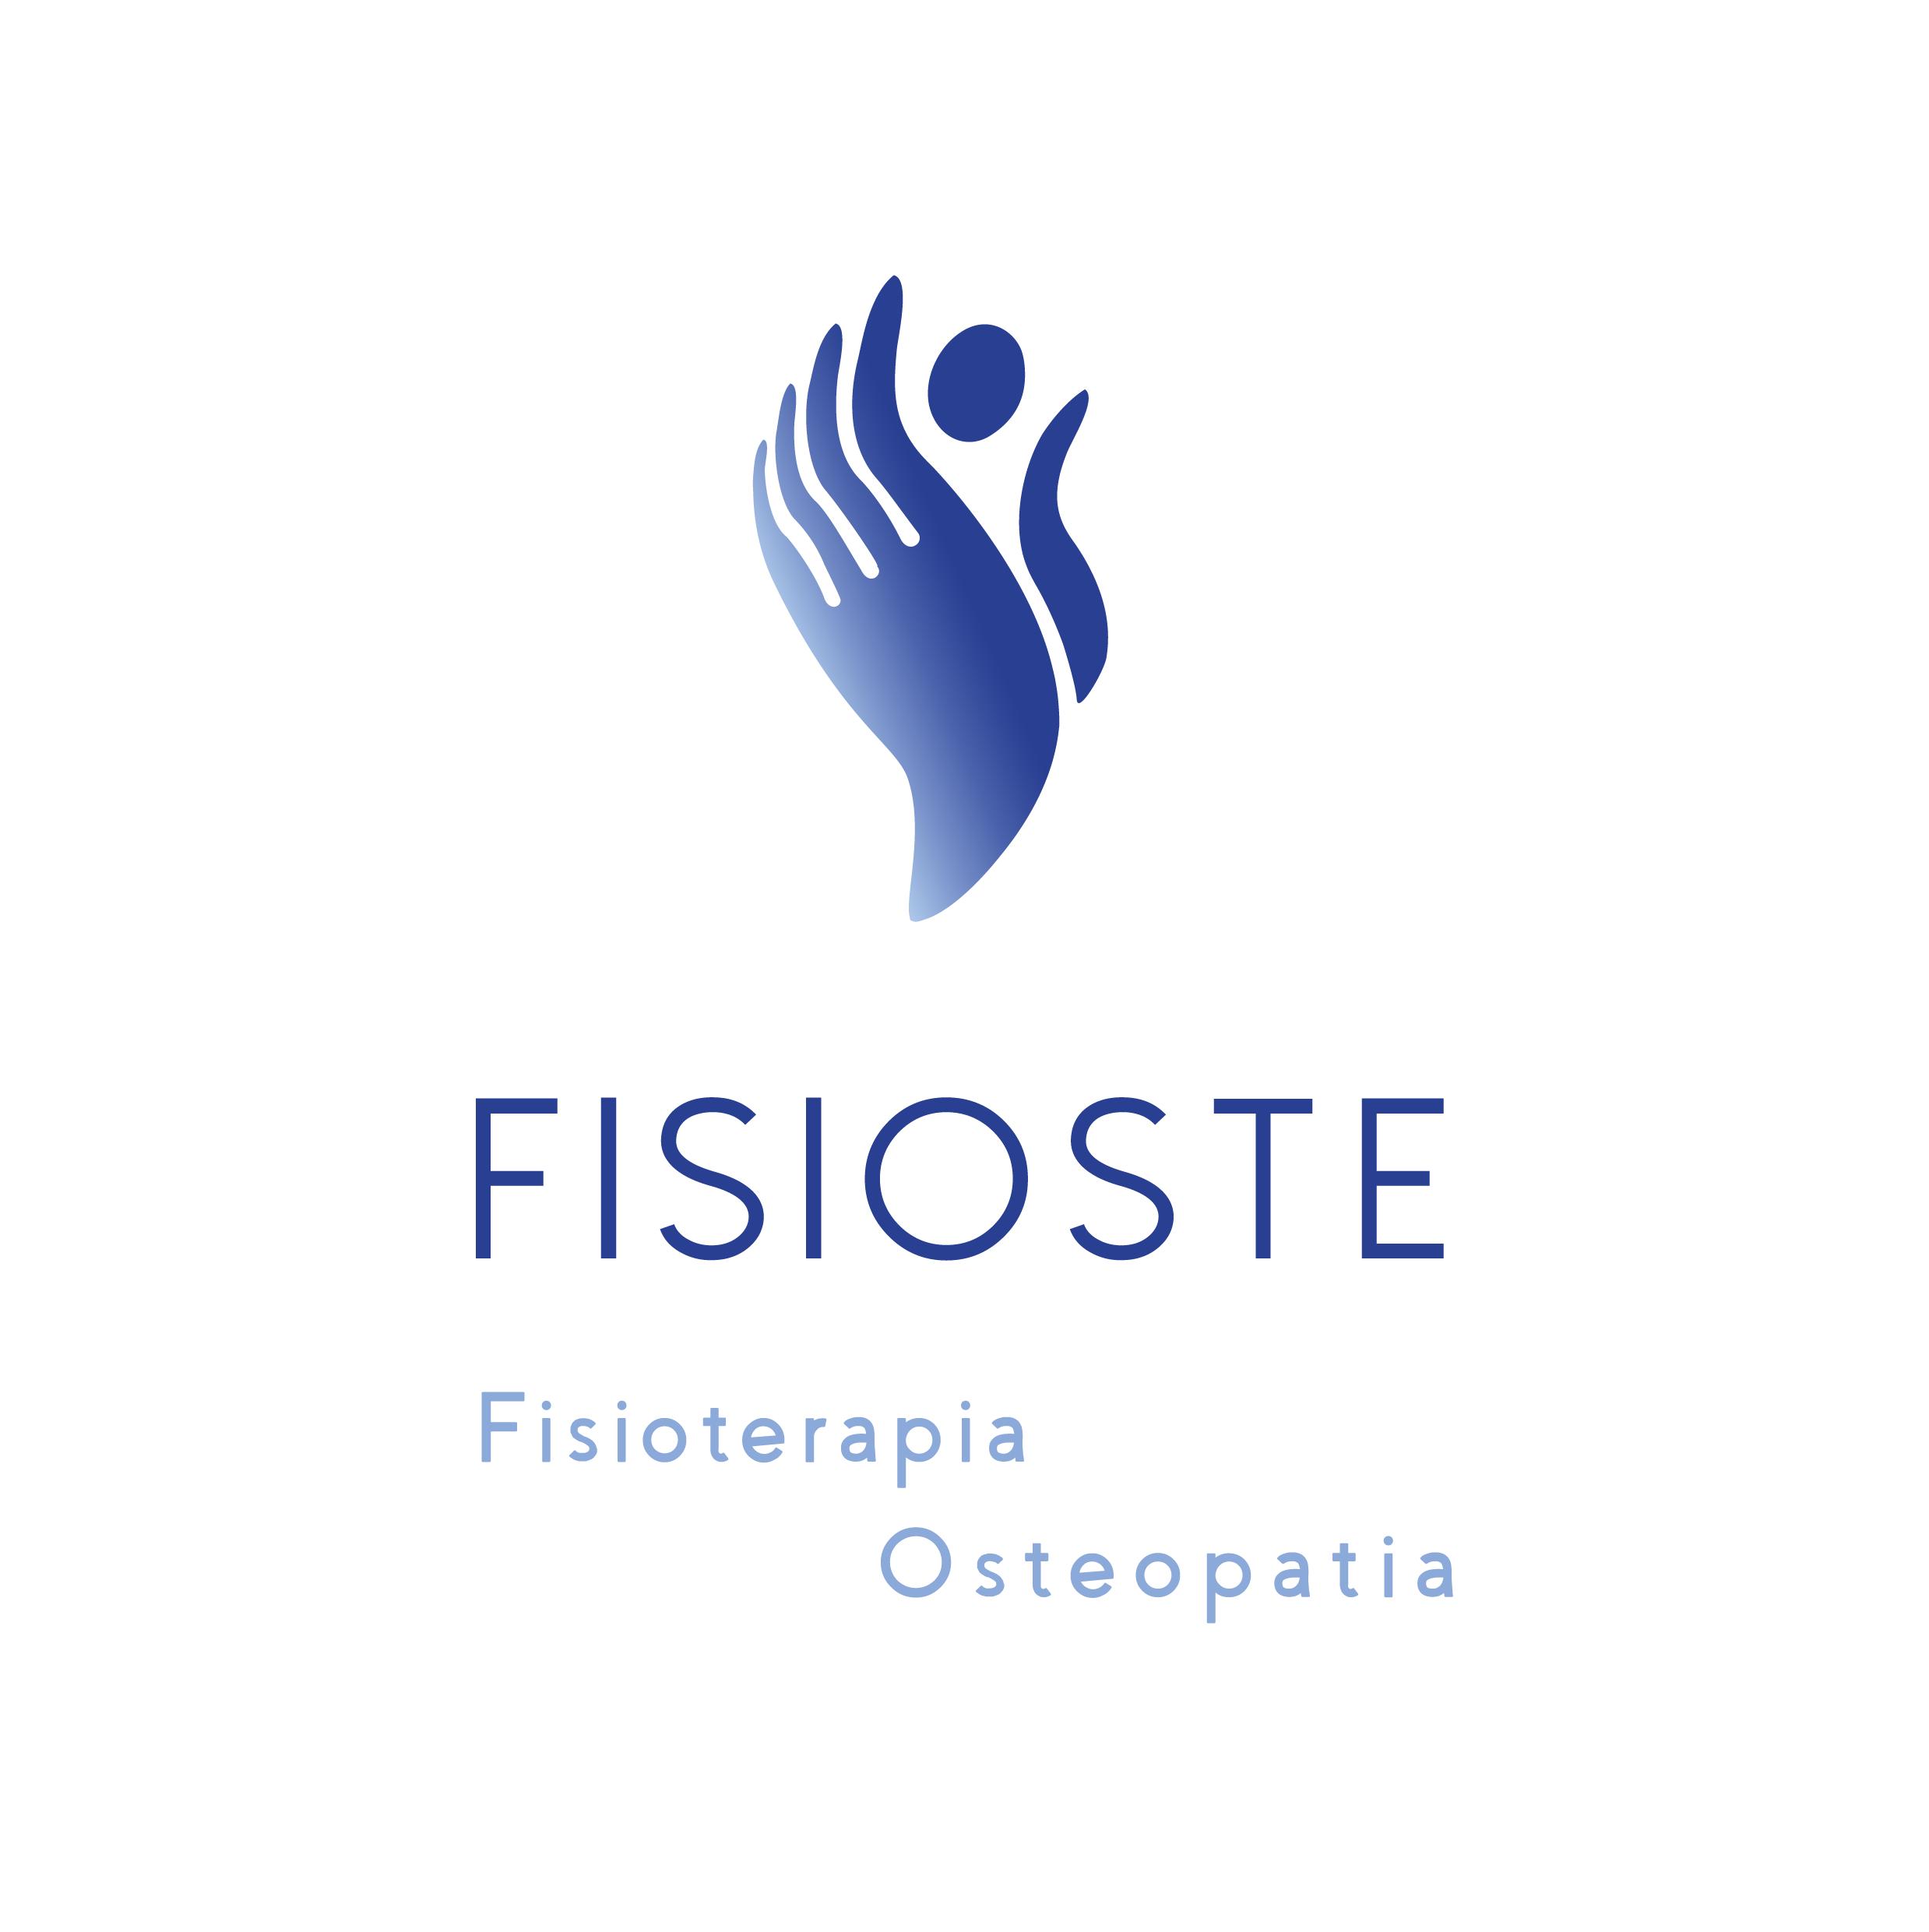 Studio di Fisioterapia e Osteopatia FISIOSTE